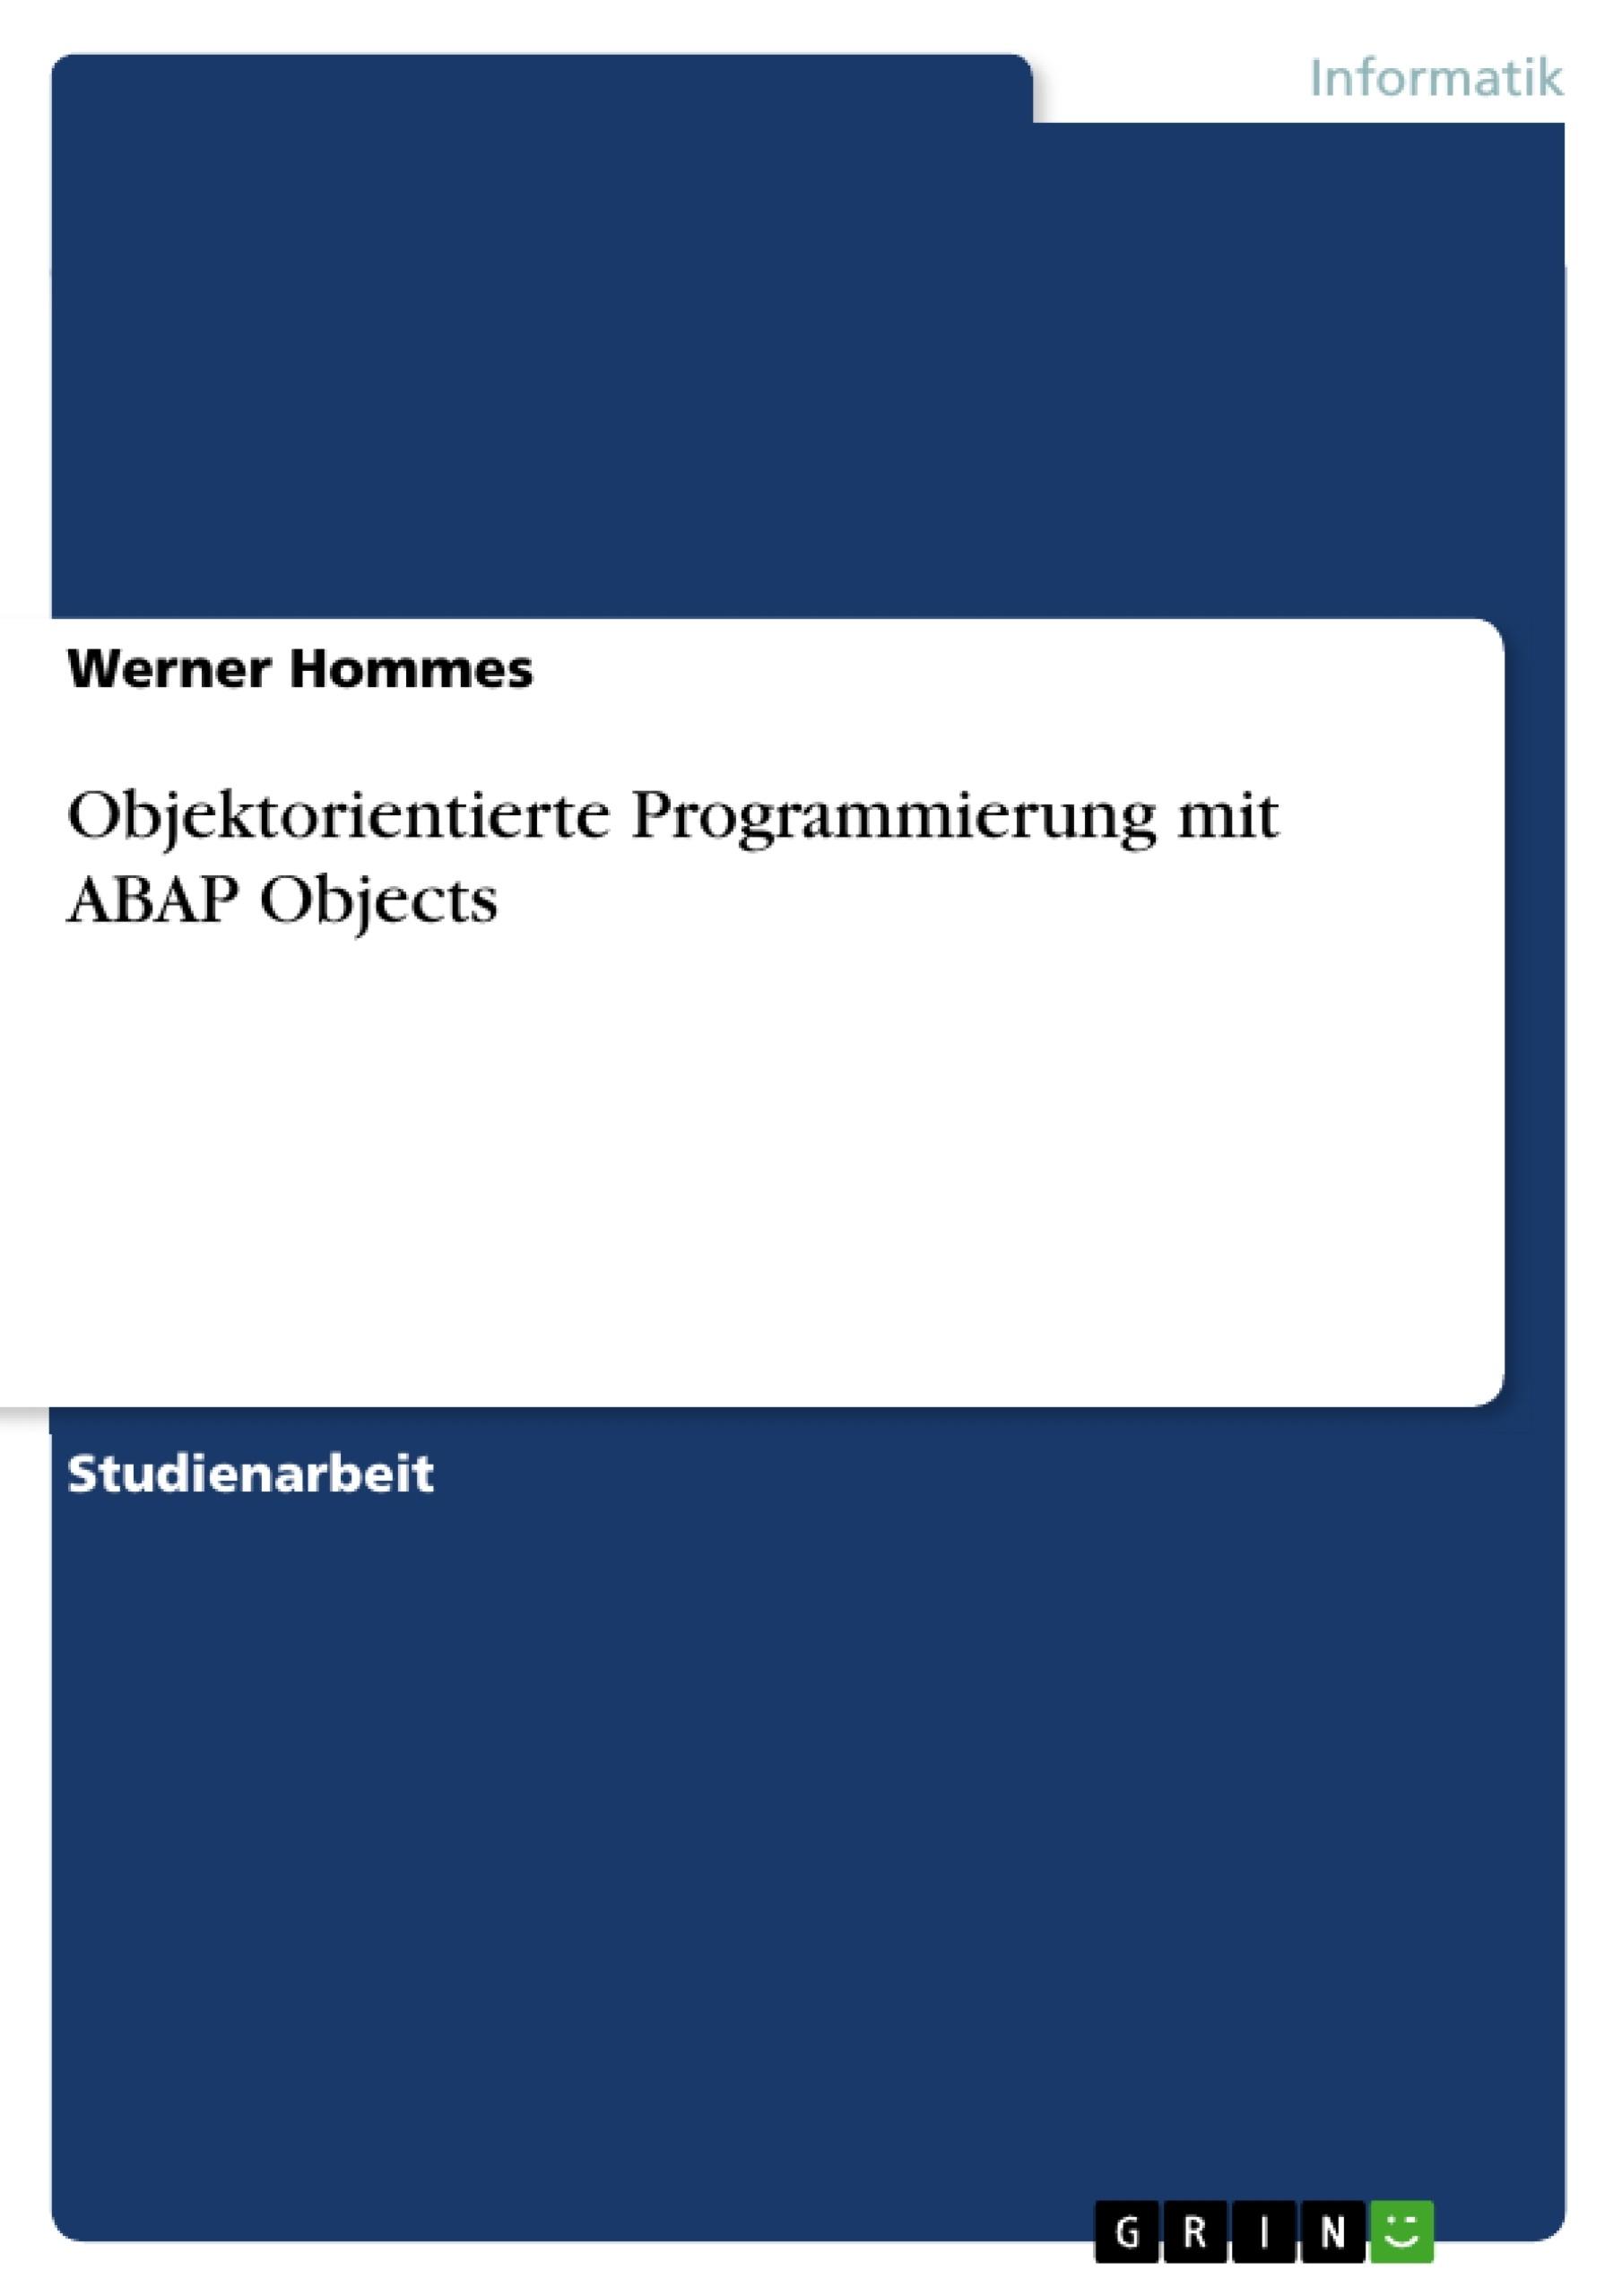 Titel: Objektorientierte Programmierung mit ABAP Objects